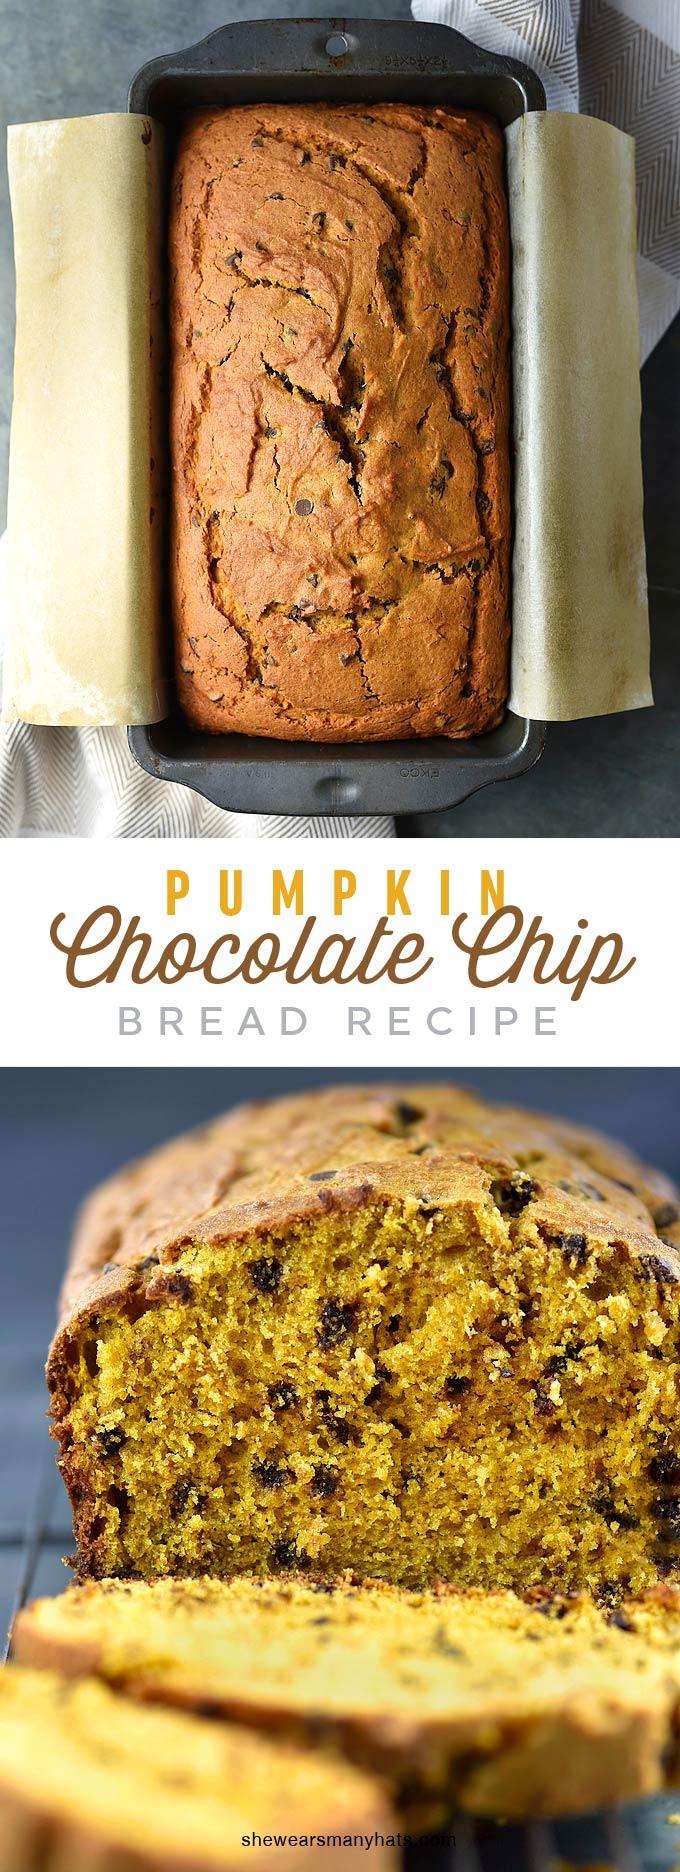 Pumpkin Chocolate Chip Bread Recipe | shewearsmanyhats.com